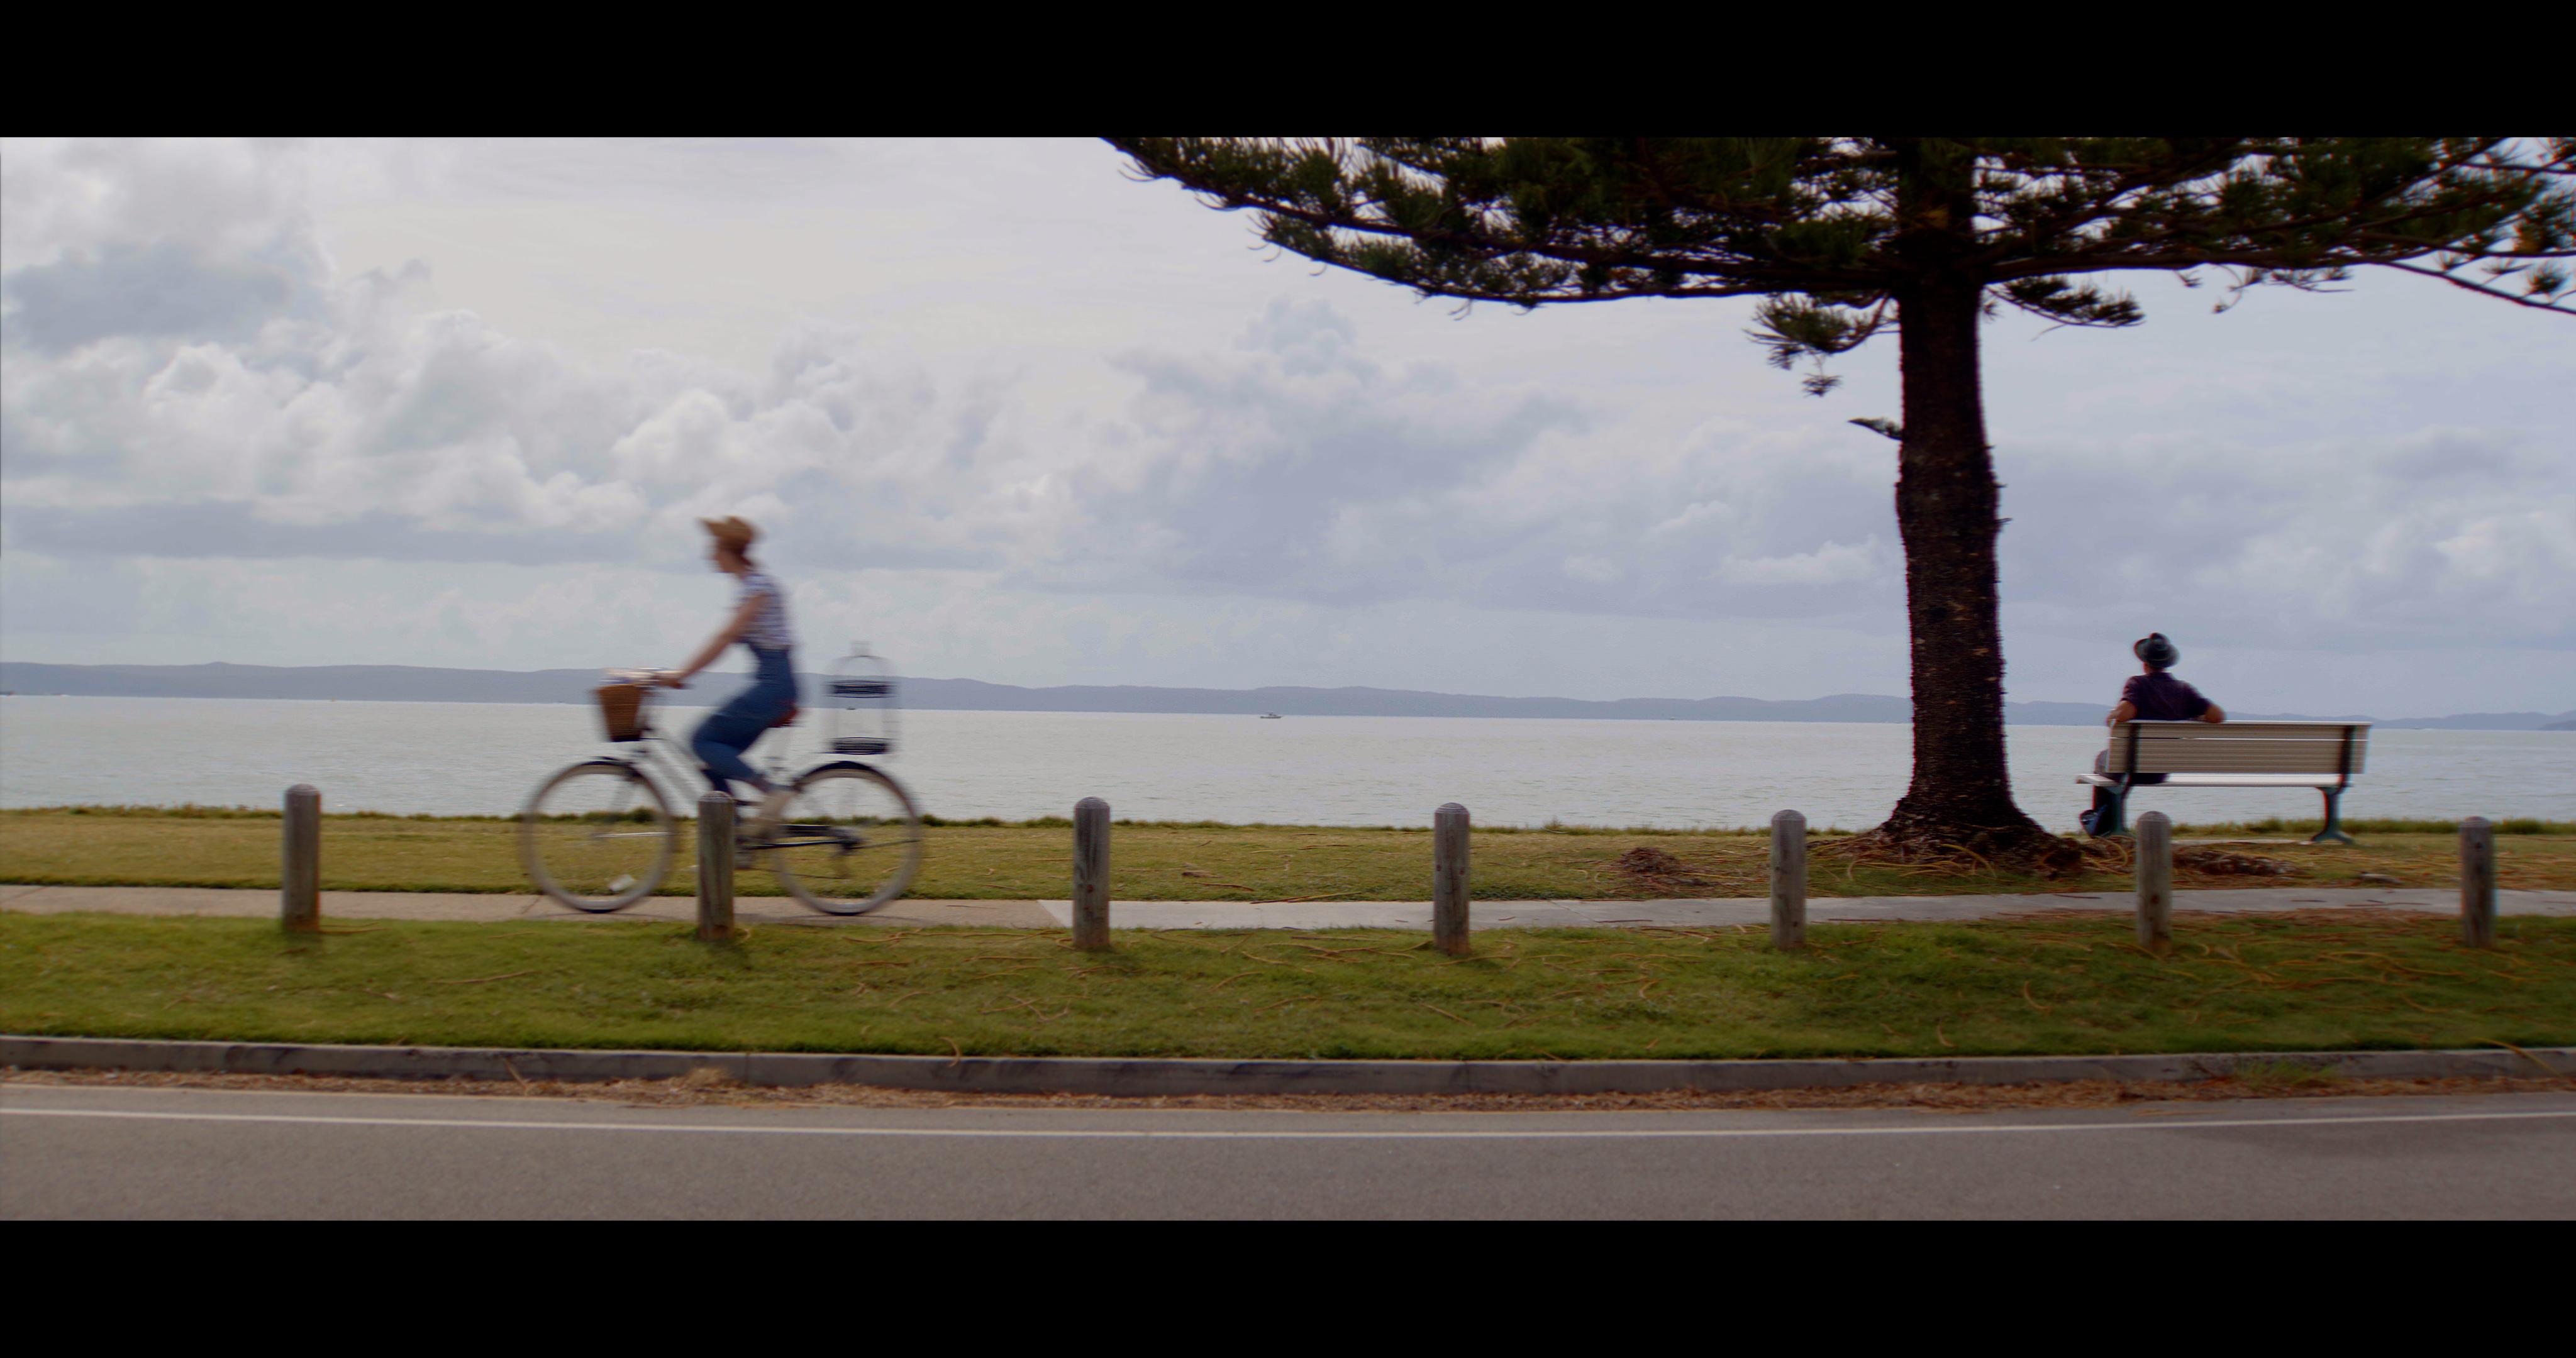 Caroline riding bike past sea side vista. Caged Creatures.